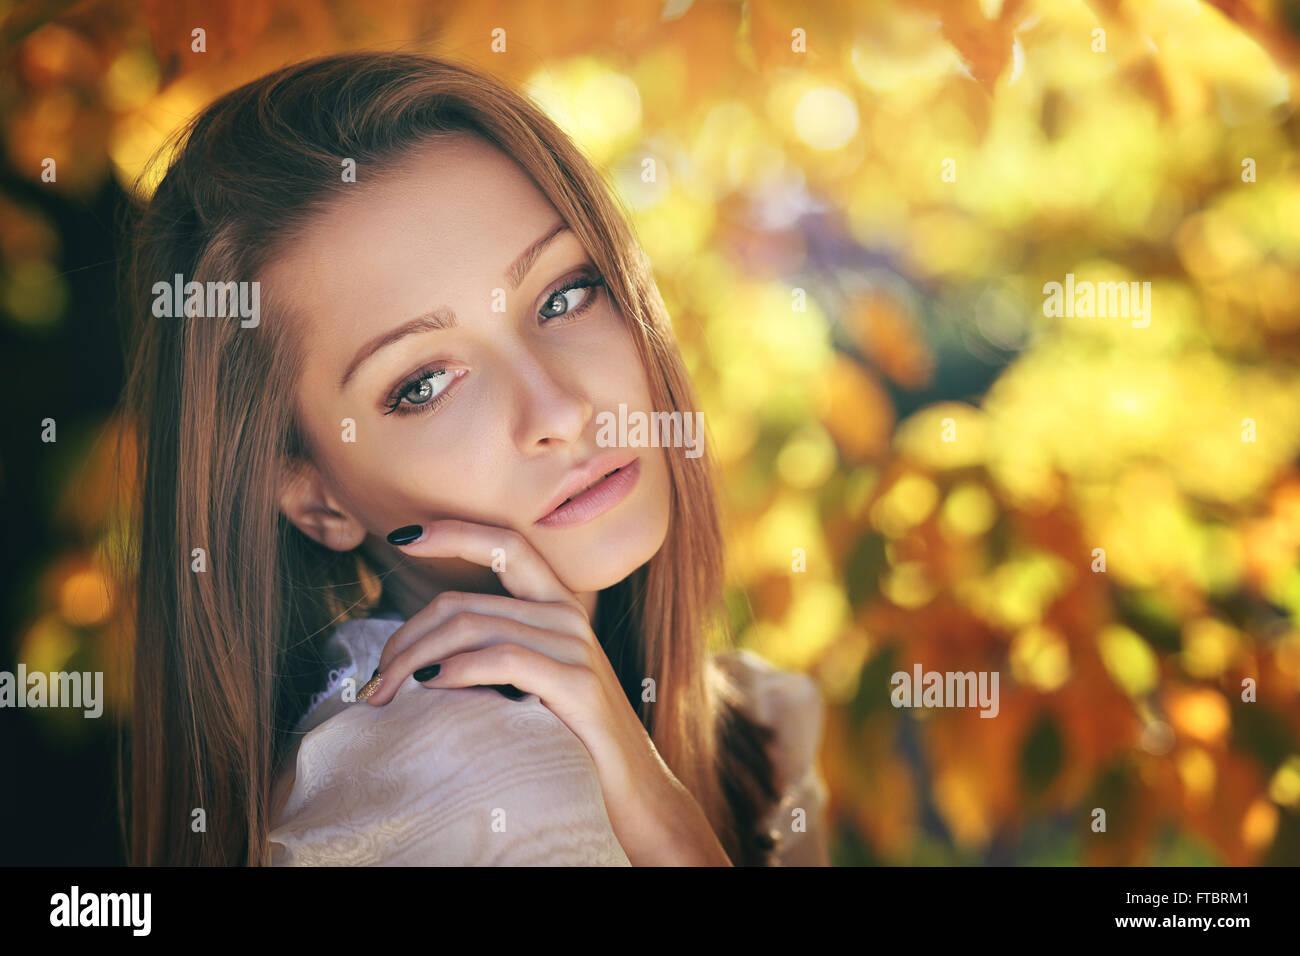 Warme Herbst-Porträt einer jungen Frau. Goldene Blätter hinter Stockbild